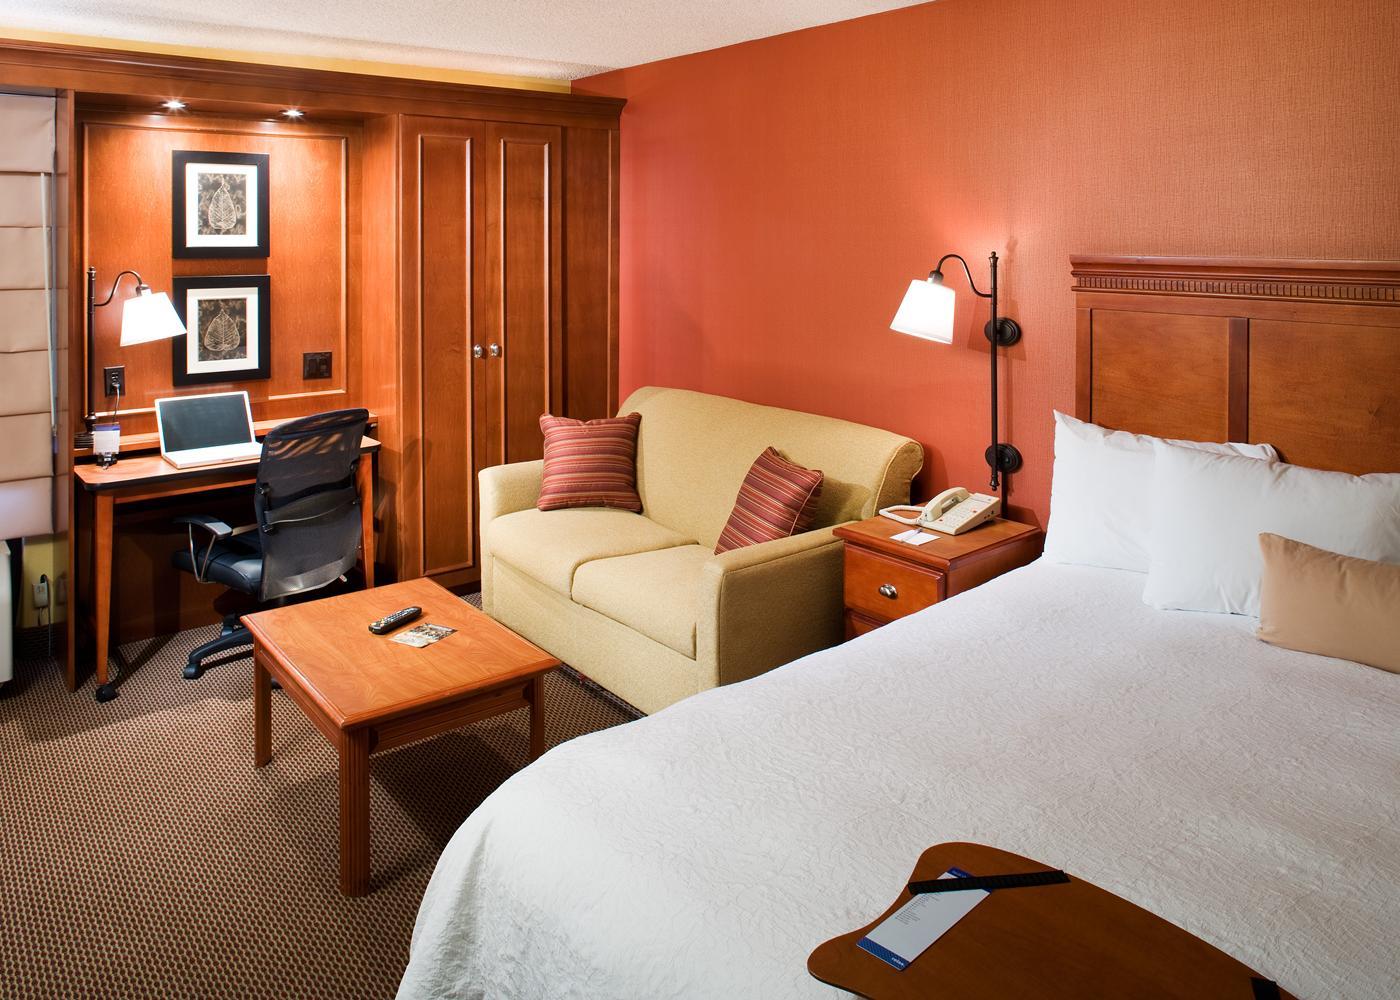 The interior of a room with orange and wood accents at Hampton Inn Santa Clarita.